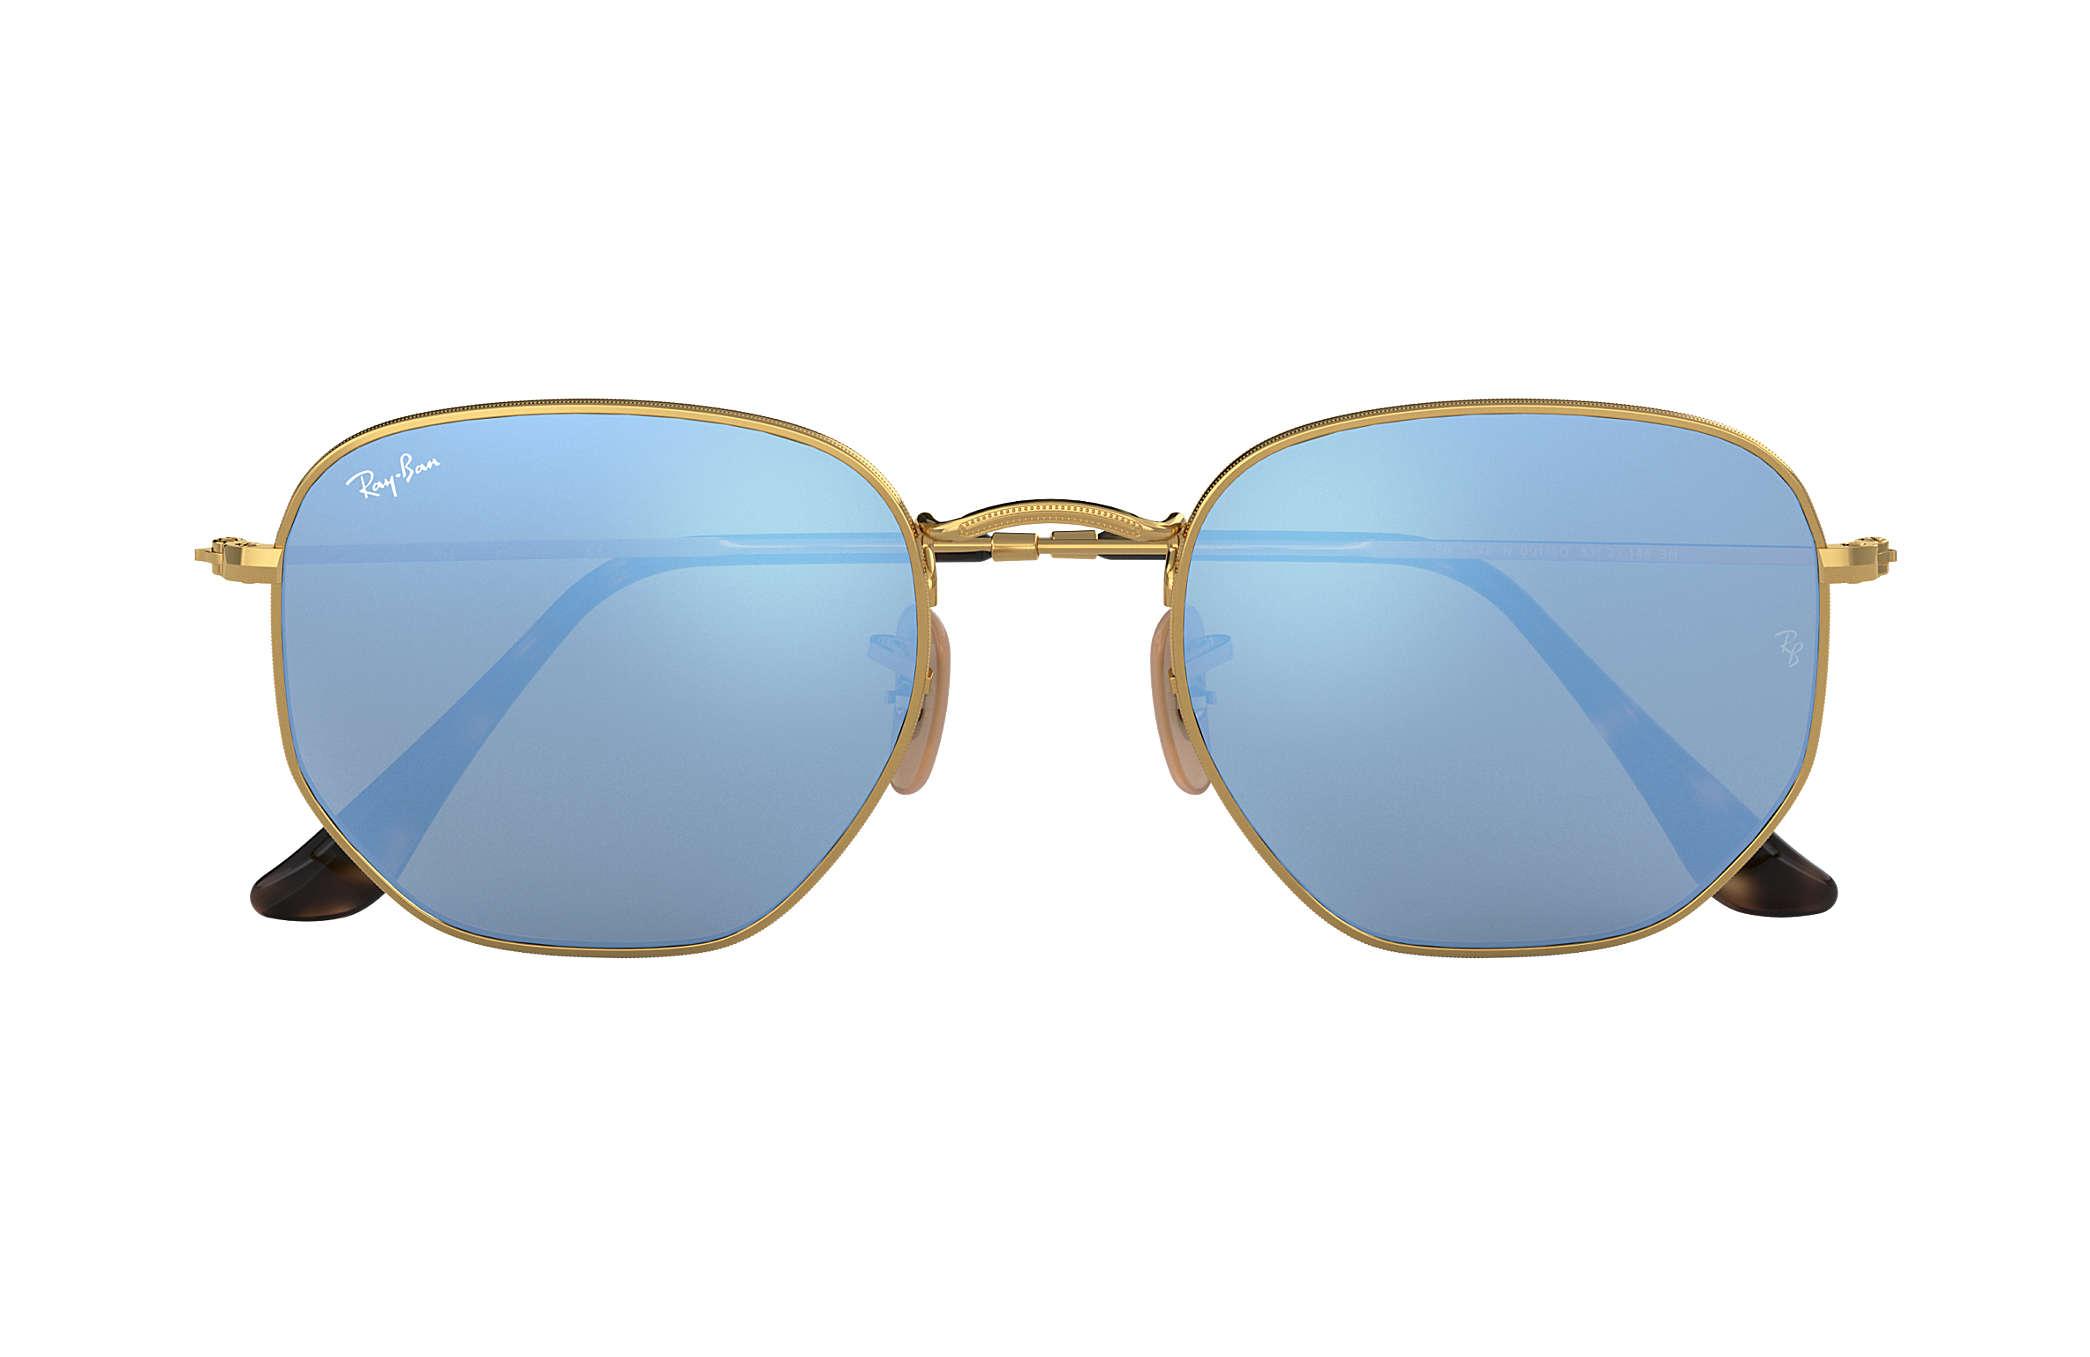 comprar online ae870 0c45a Descubre el modelo Hexagonal Flat Lenses en ray-ban.com